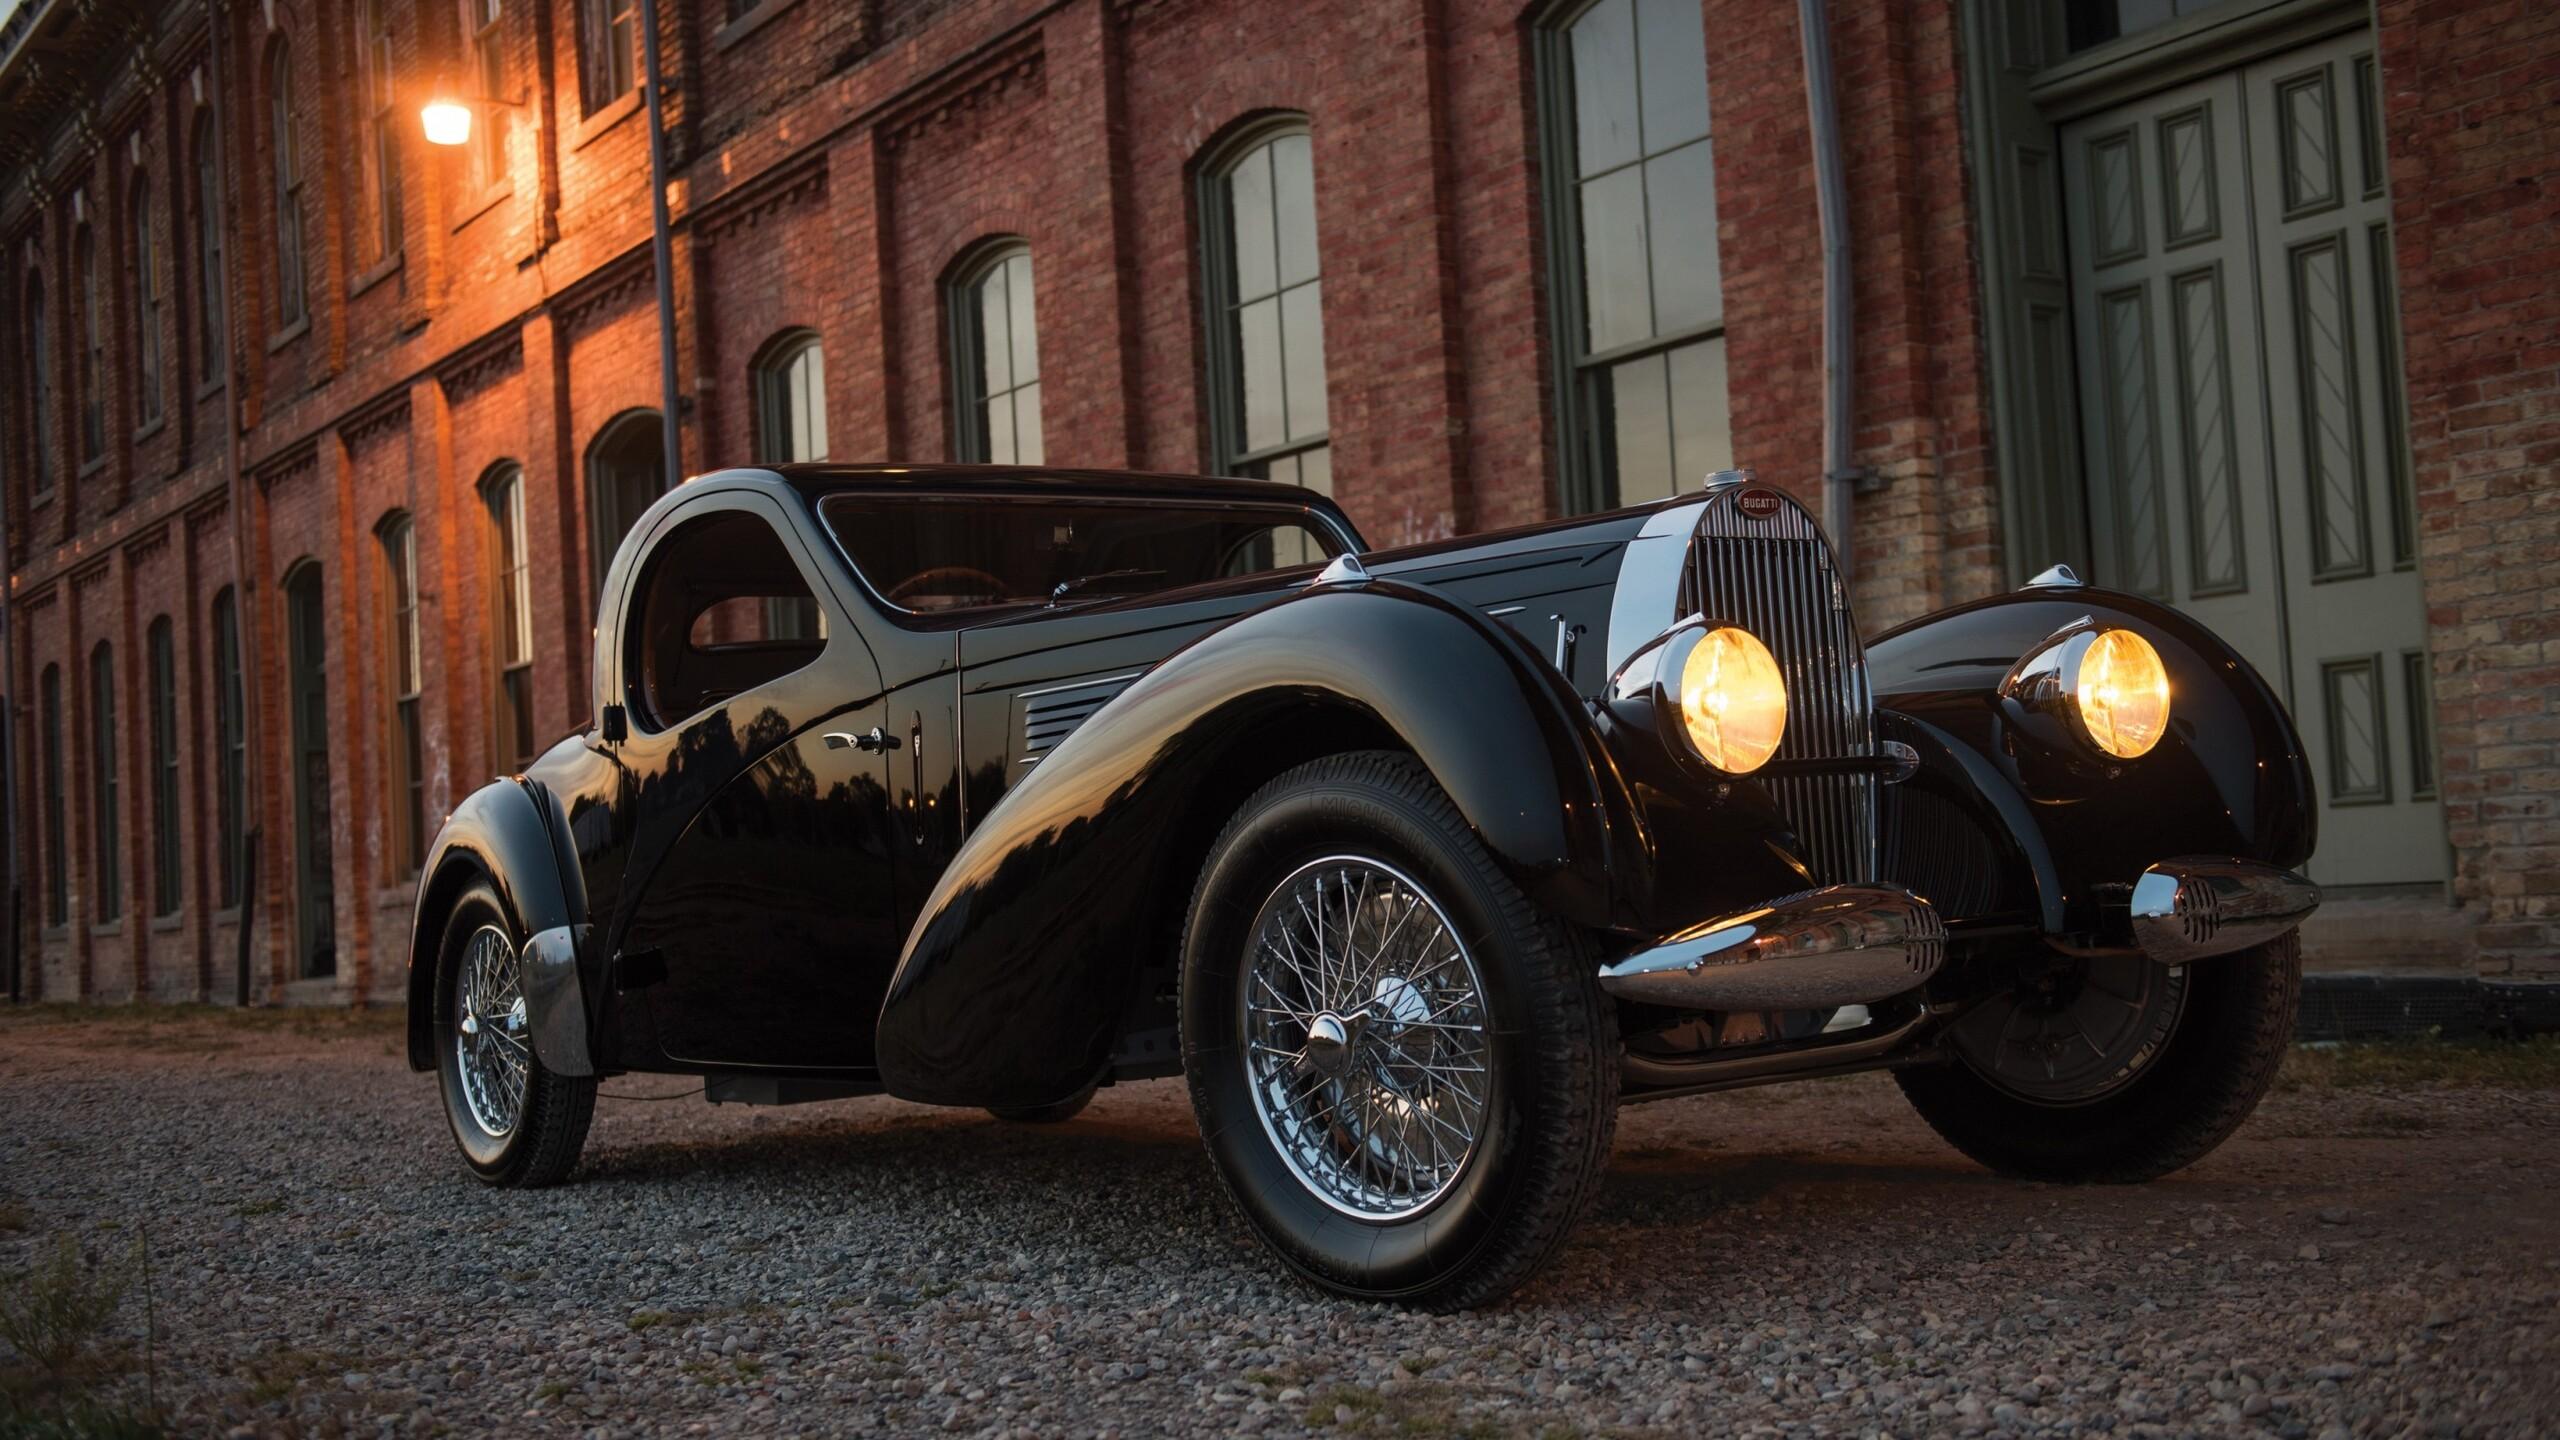 2560x1440 Bugatti Vintage Car 1440P Resolution HD 4k ...